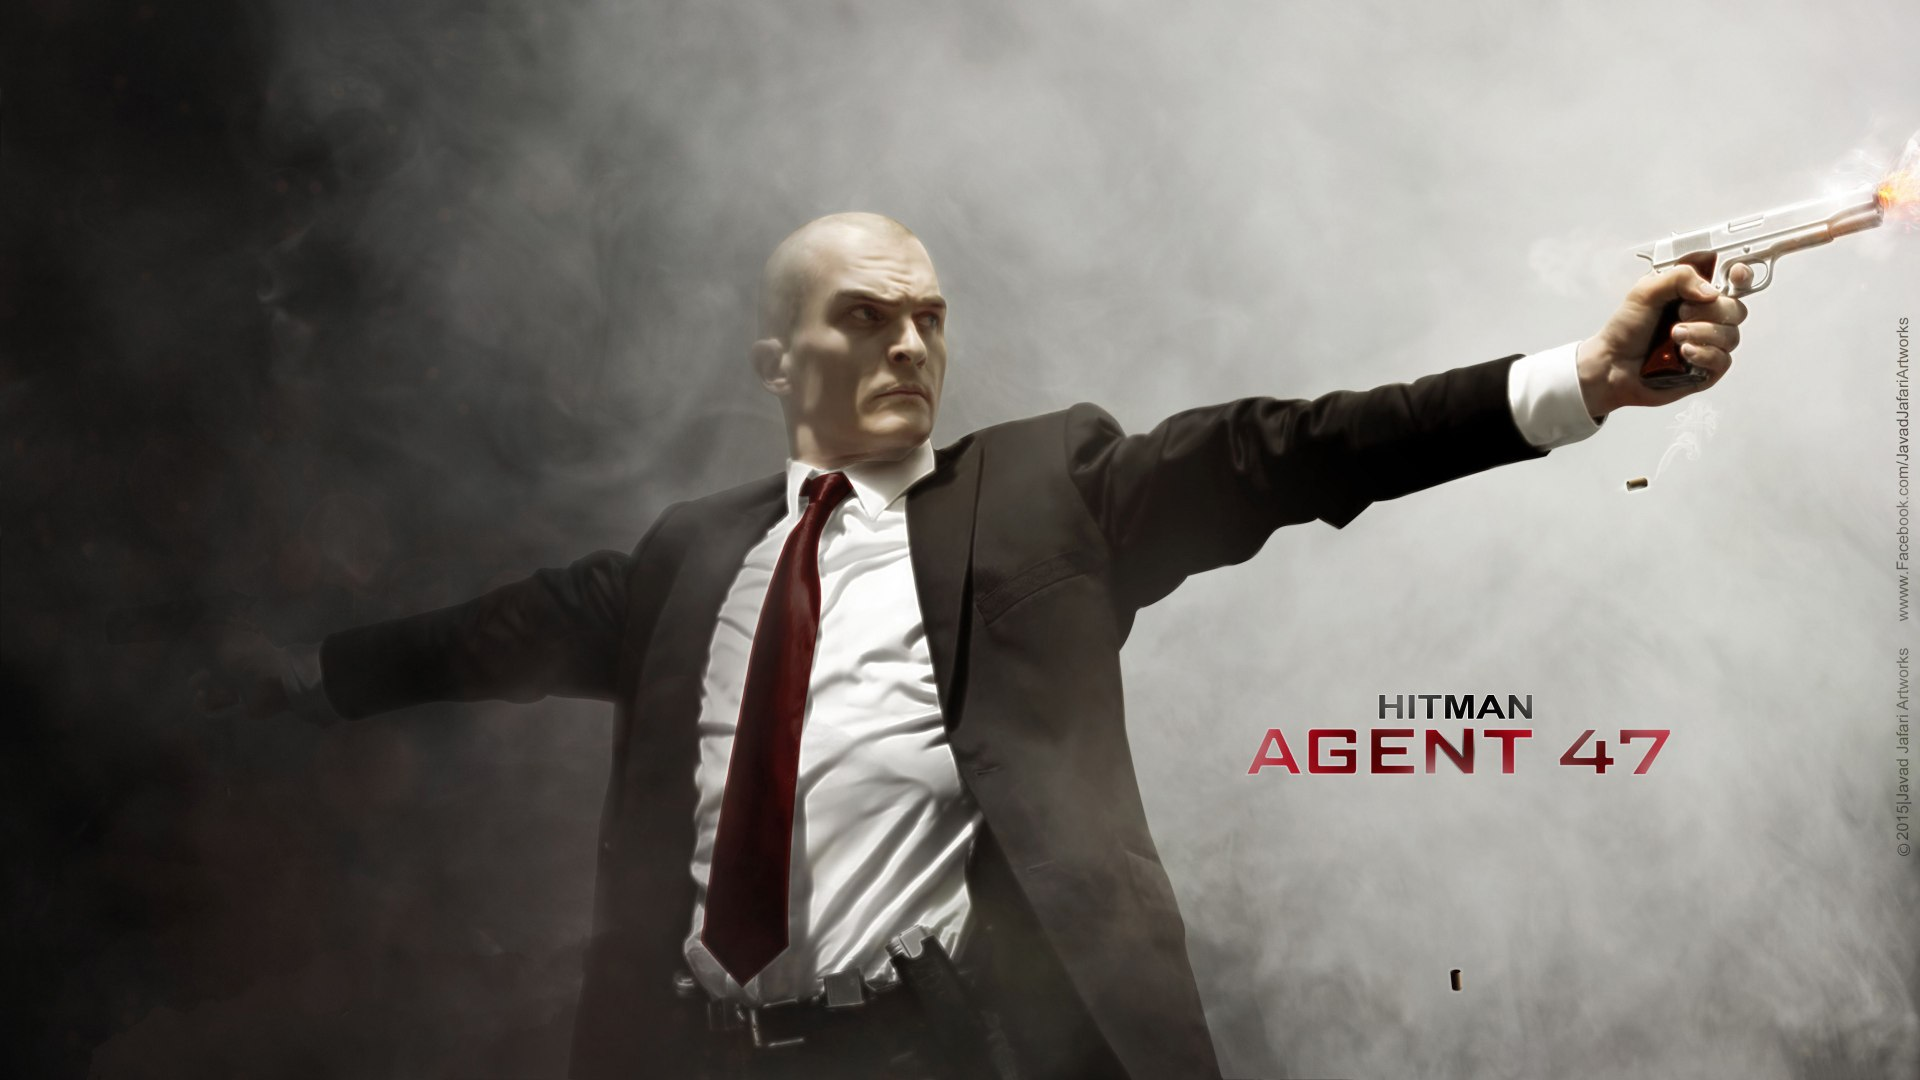 Hitman Agent 47 2015 Full Movie Video Dailymotion